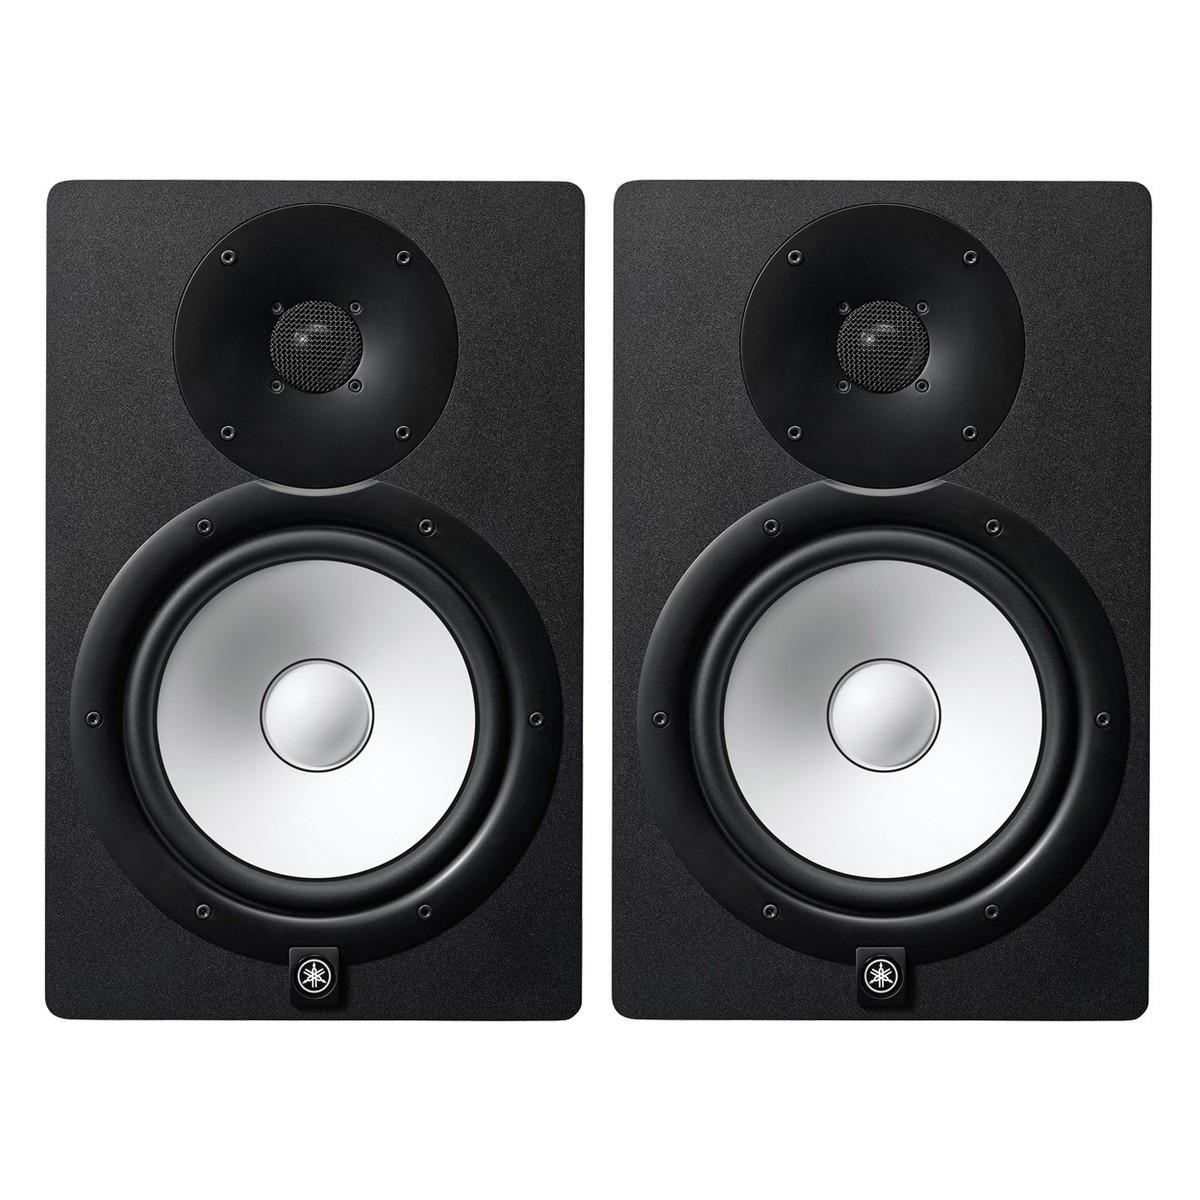 yamaha hs8i active studio monitor pair black at gear4music. Black Bedroom Furniture Sets. Home Design Ideas